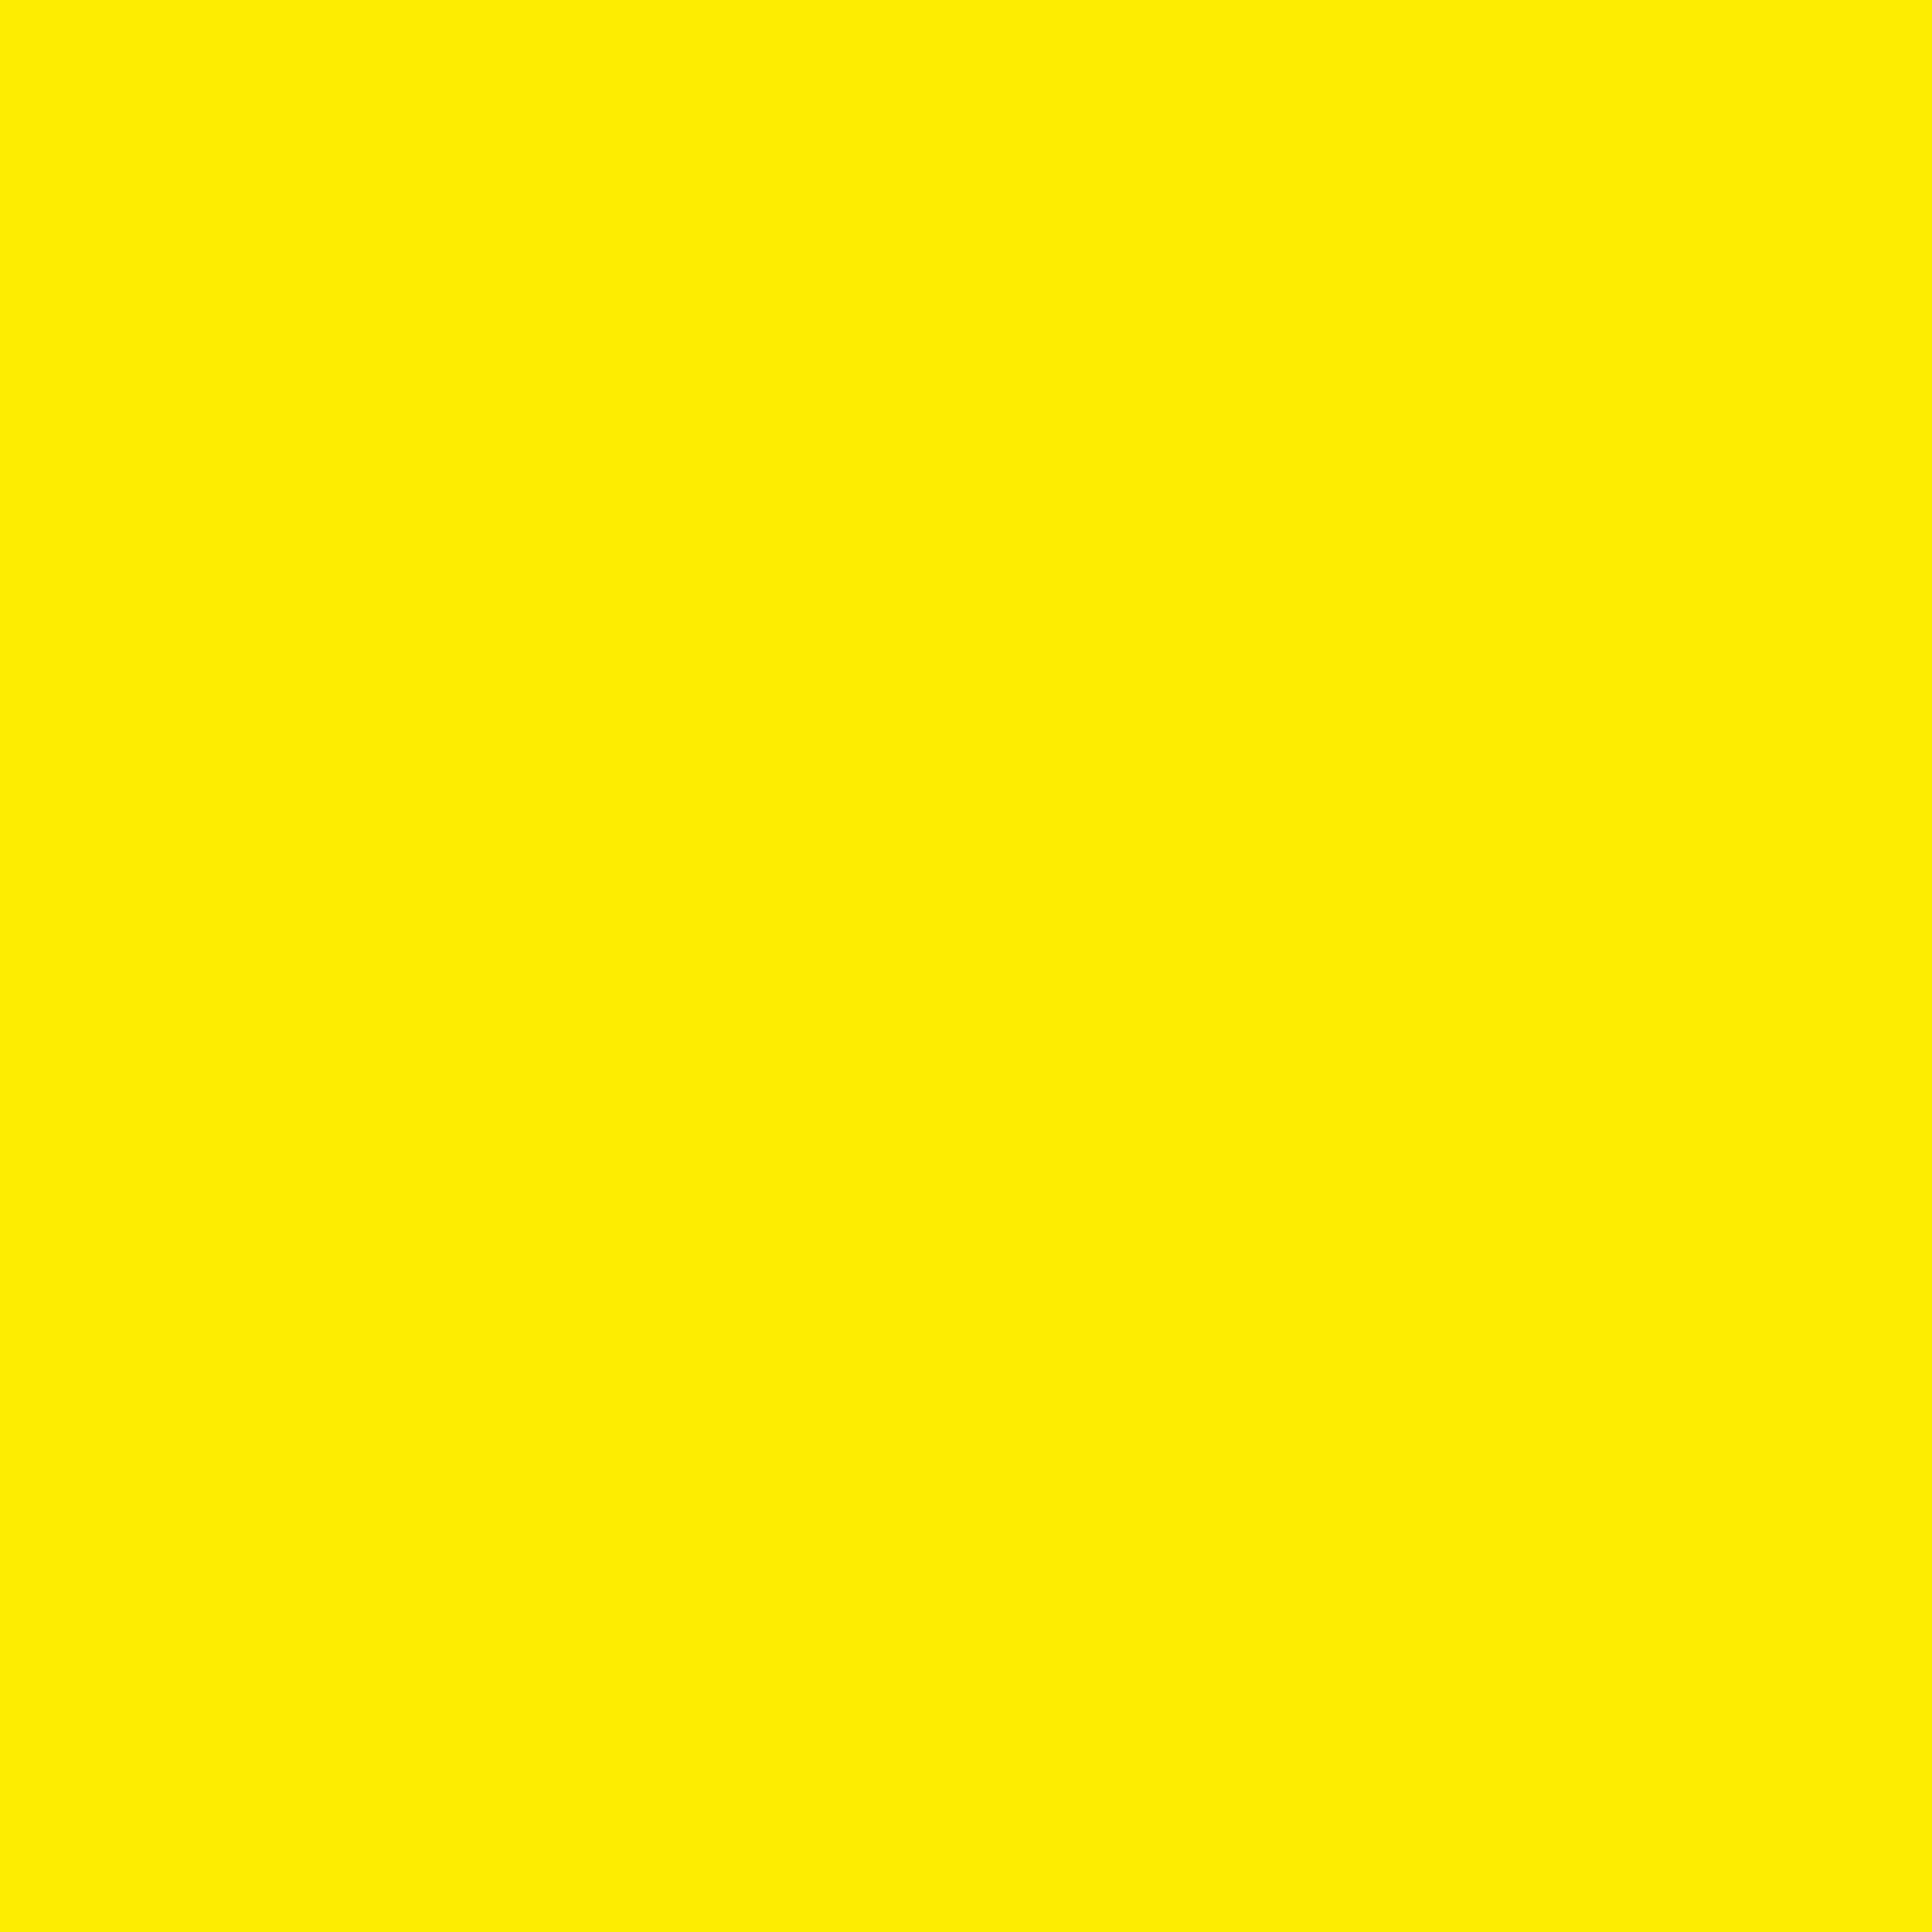 2048x2048 Aureolin Solid Color Background